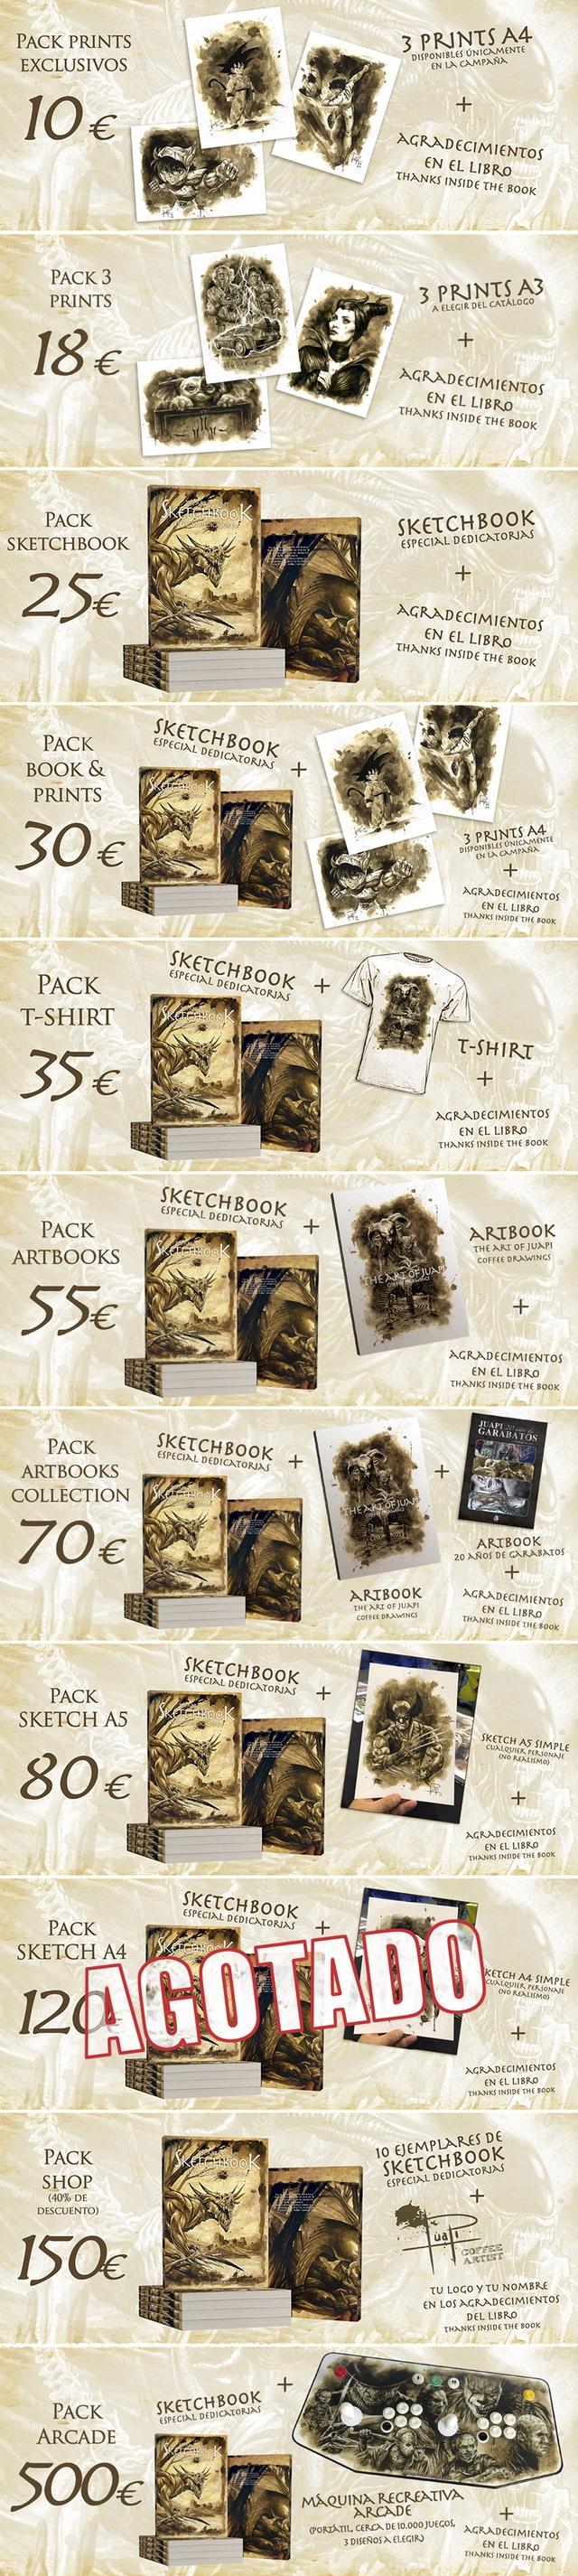 PACK PRINTS EXCLUSIVOS 10€ + LIBRO PACK 3 PRINTS 3 PRINTSA 18€ INSIDE THE BOOK PACK SKETCHBOOK SKETCHBOOK AGRADECIMIENTO PACK BOOK & PRINTS PACK T-SHIRT 35€ TKETCHBOOK PACK ARTBOOKS PACK TKETCHBOOK ARTBOOKS + COLLECTION 70€ ARIBOOK TKETCHBOOK PACK SKETCH A5 PACK SKETCH A4 PACK SHOP PACK ARCADE MAQUINA RECREATIVA ARCADE